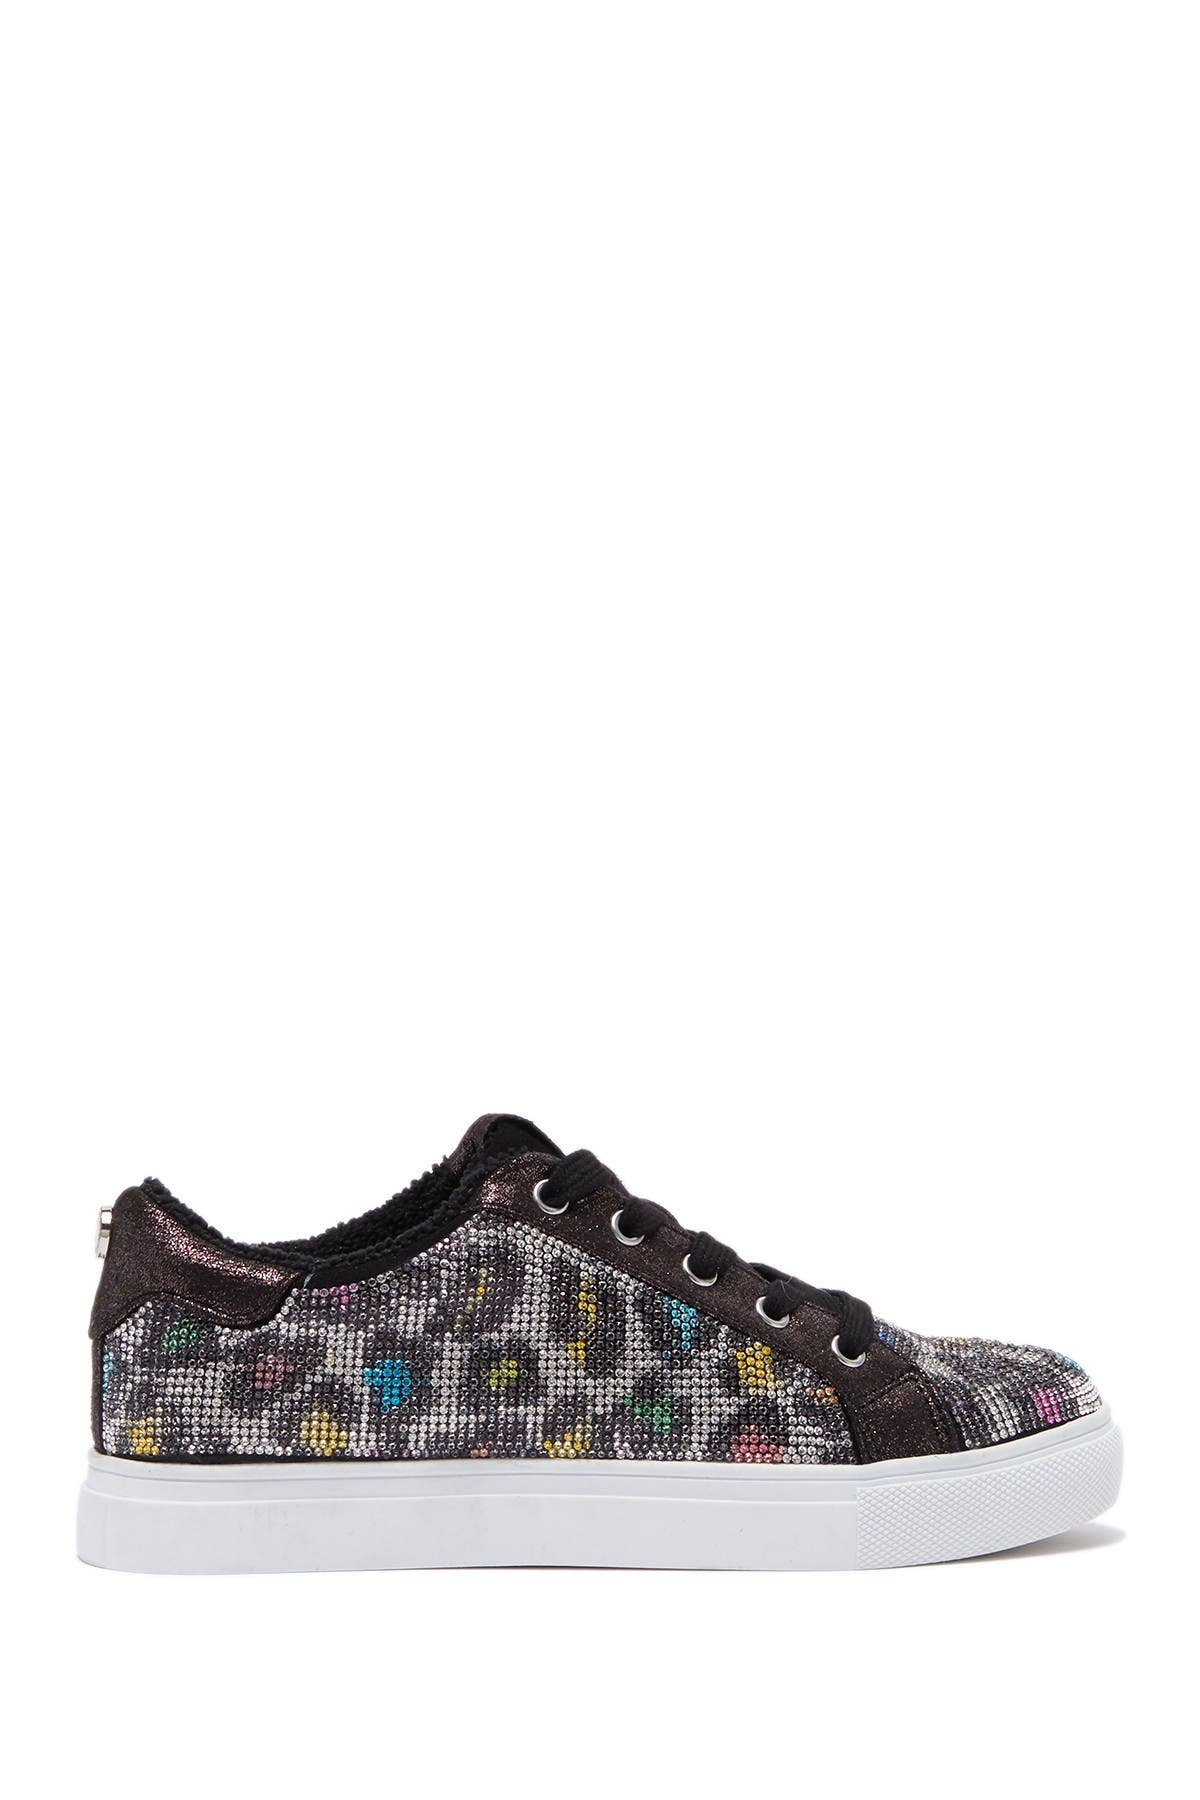 Image of Steve Madden Ceecee Embellished Leopard Print Sneaker